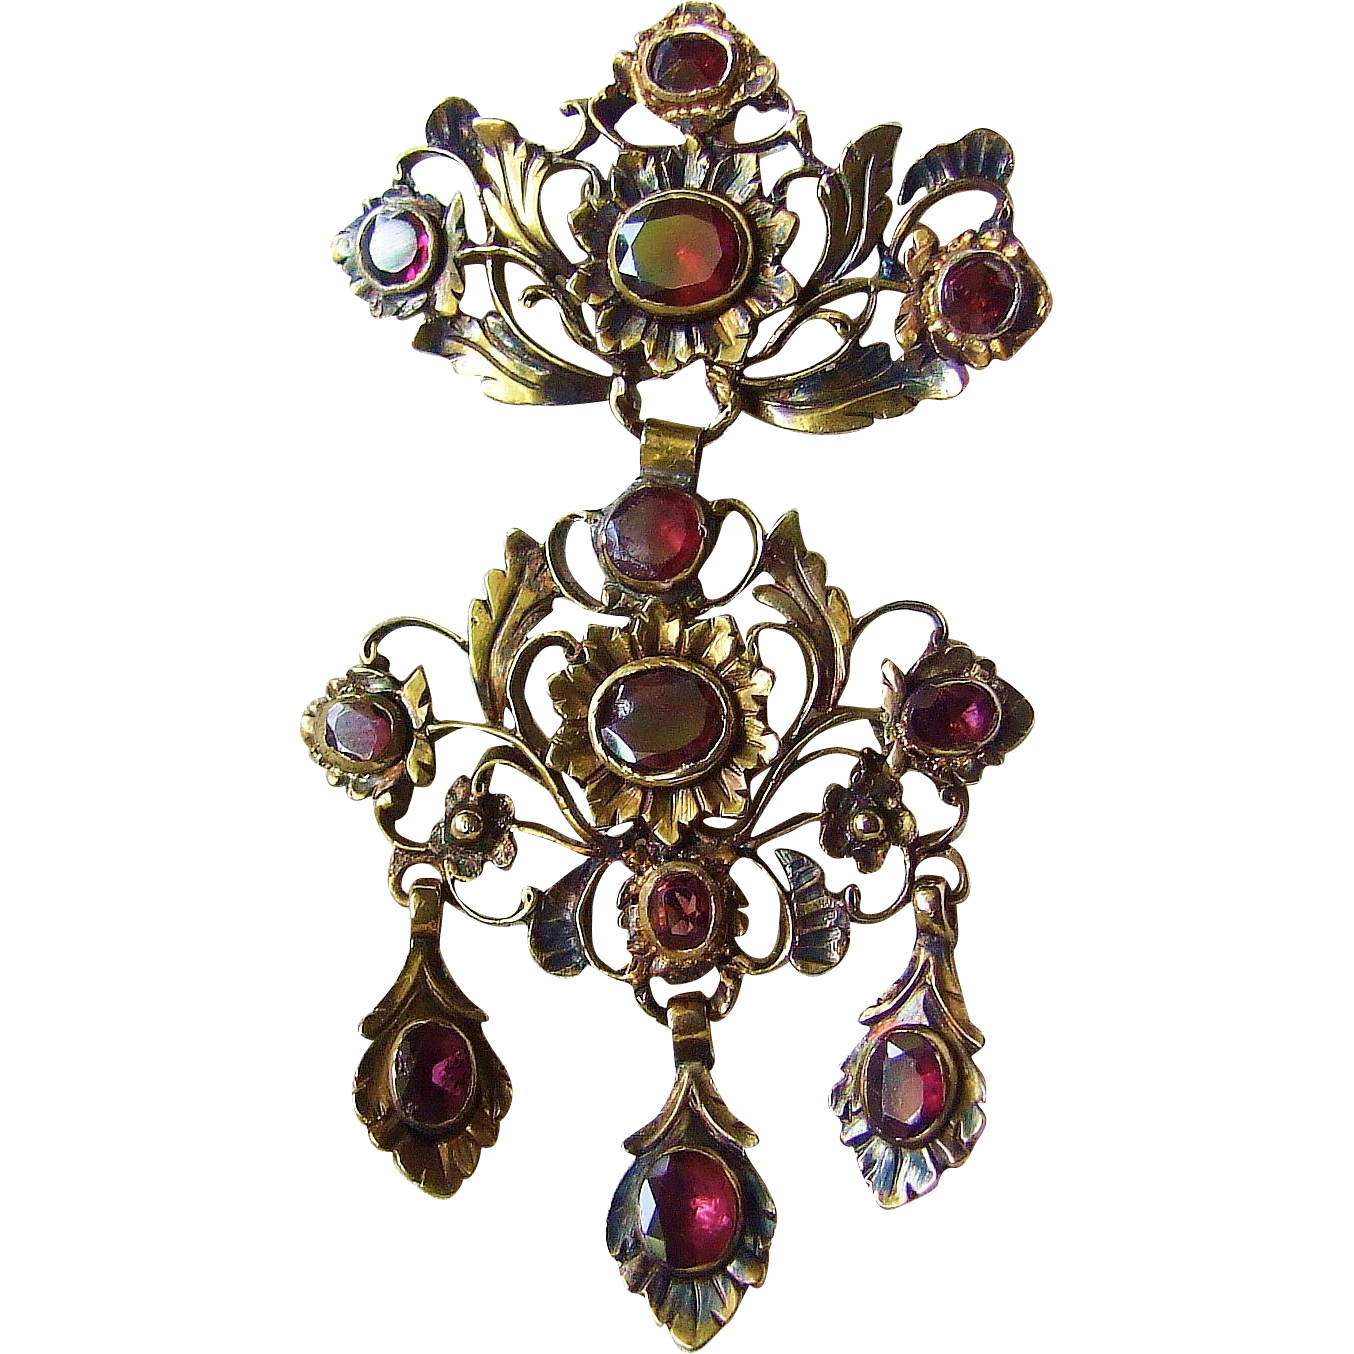 Fabulous 18th century Georgian Period Gold Garnet Girandole Pendant, circa 1780